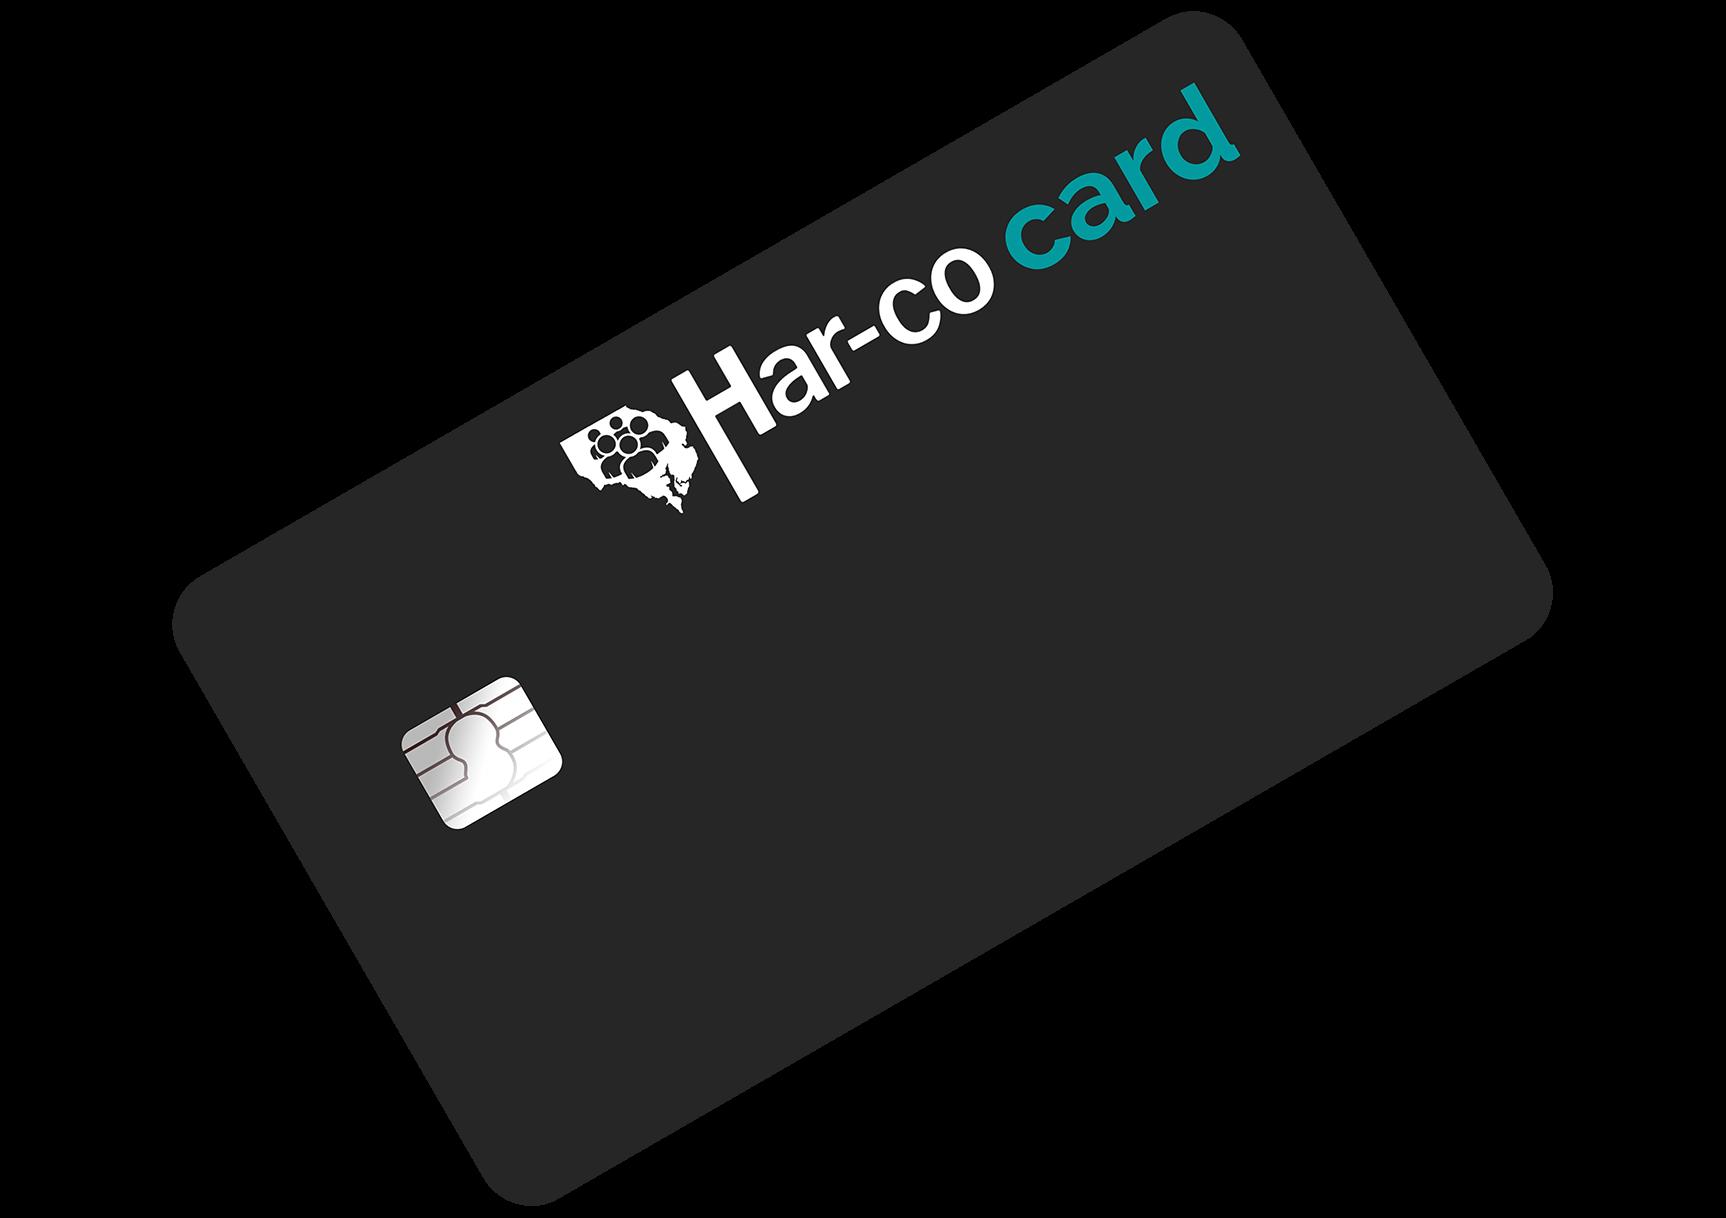 Har-co card